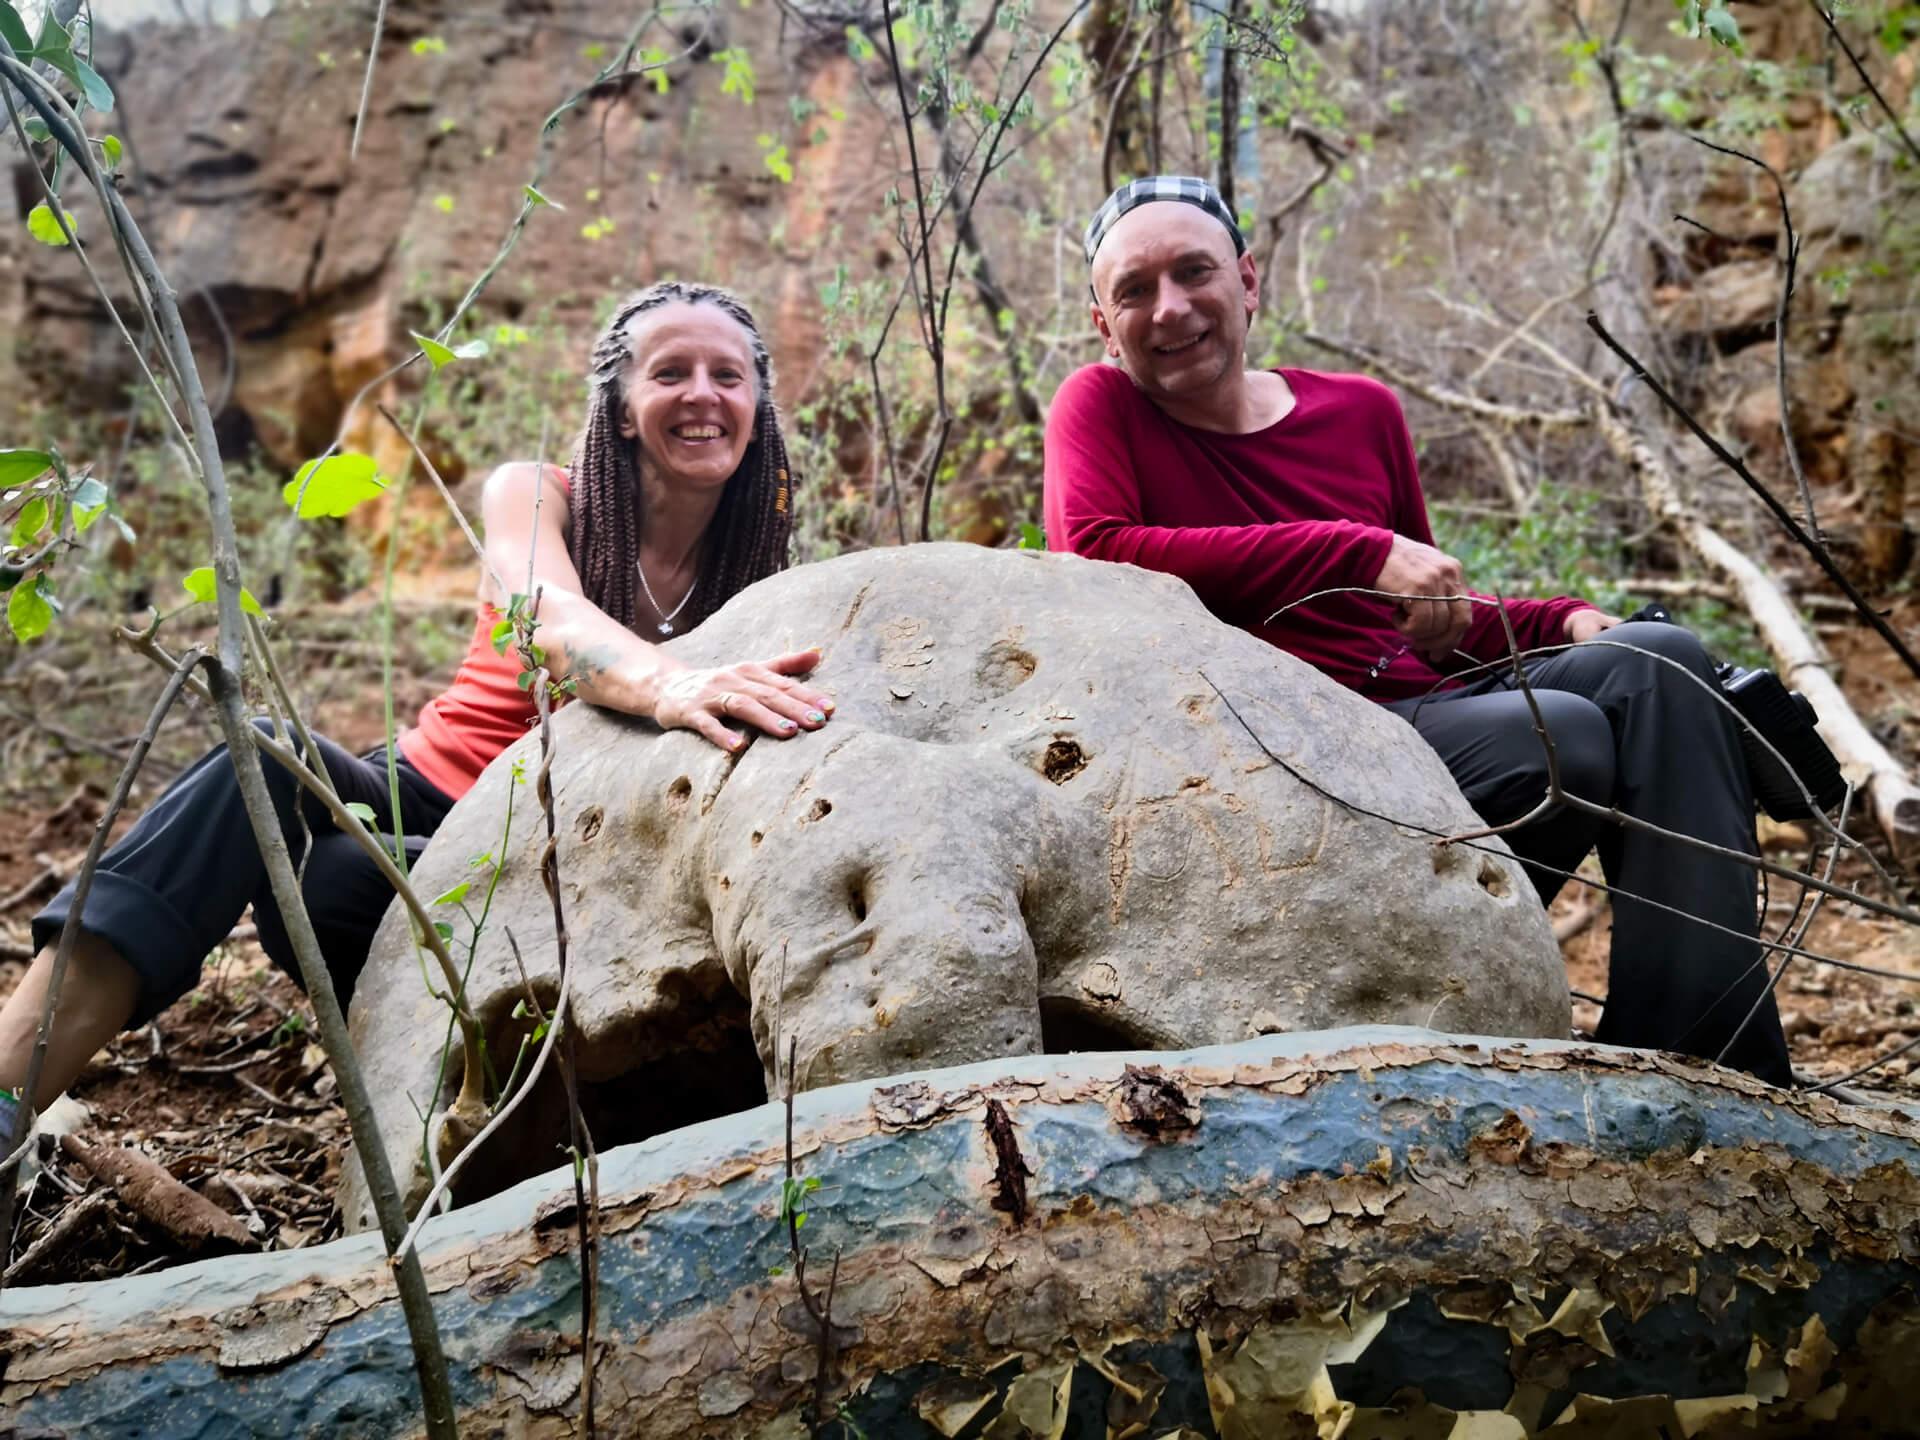 Ethiopia-Pyrenacantha malvifolia-plants-landscale-Sof Omar-caves-adventures-nature